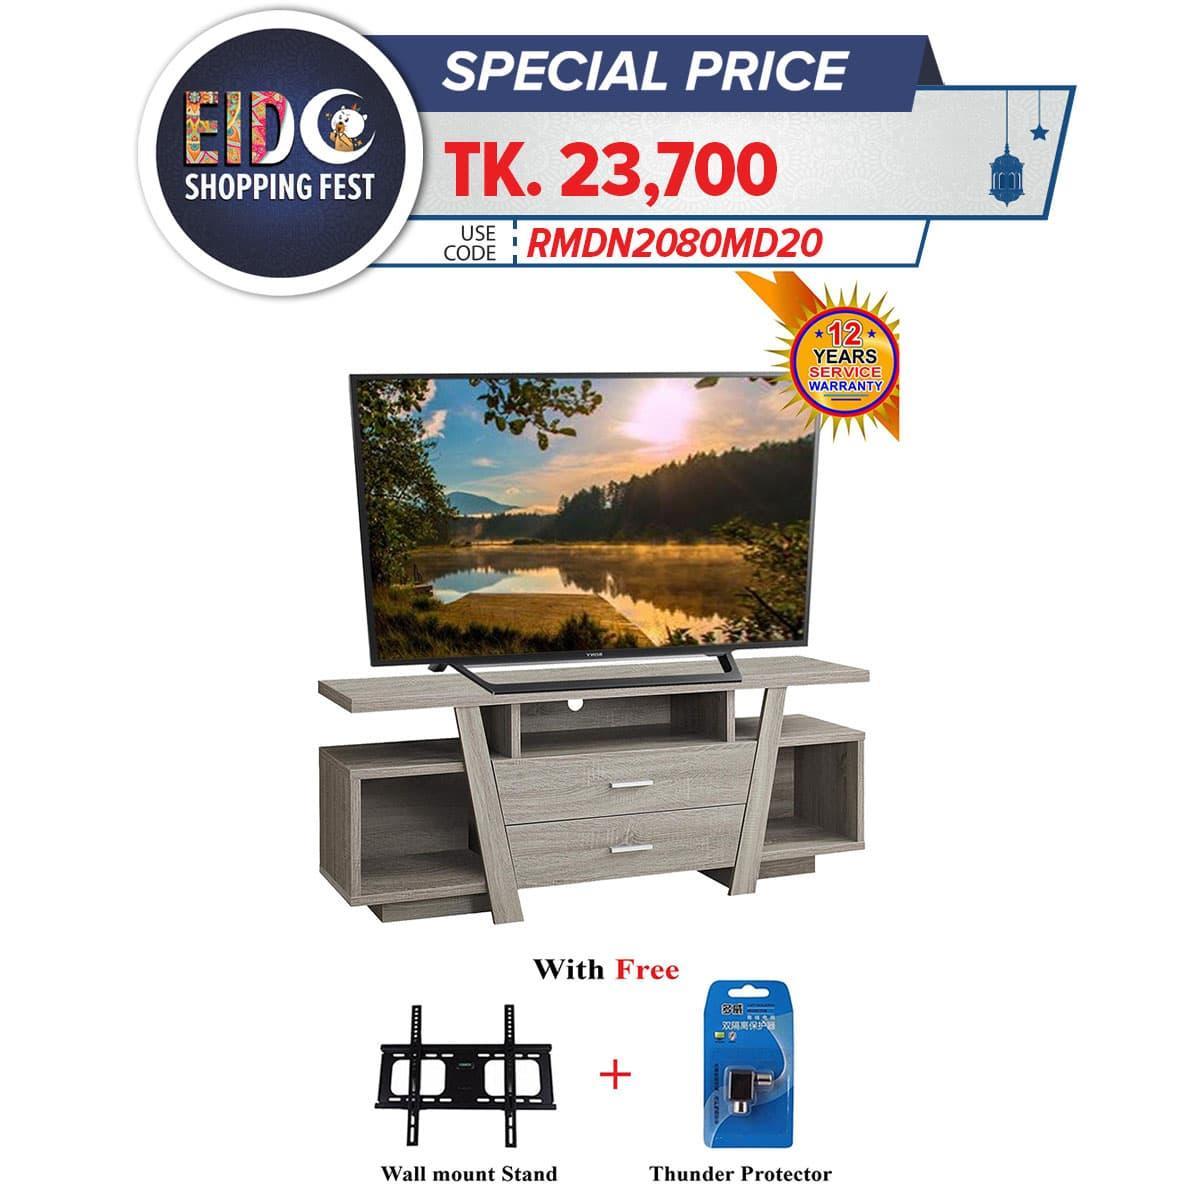 9f46f937cce Smart TV Price In Bangladesh - Buy Smart Led TV Online - Daraz.com.bd